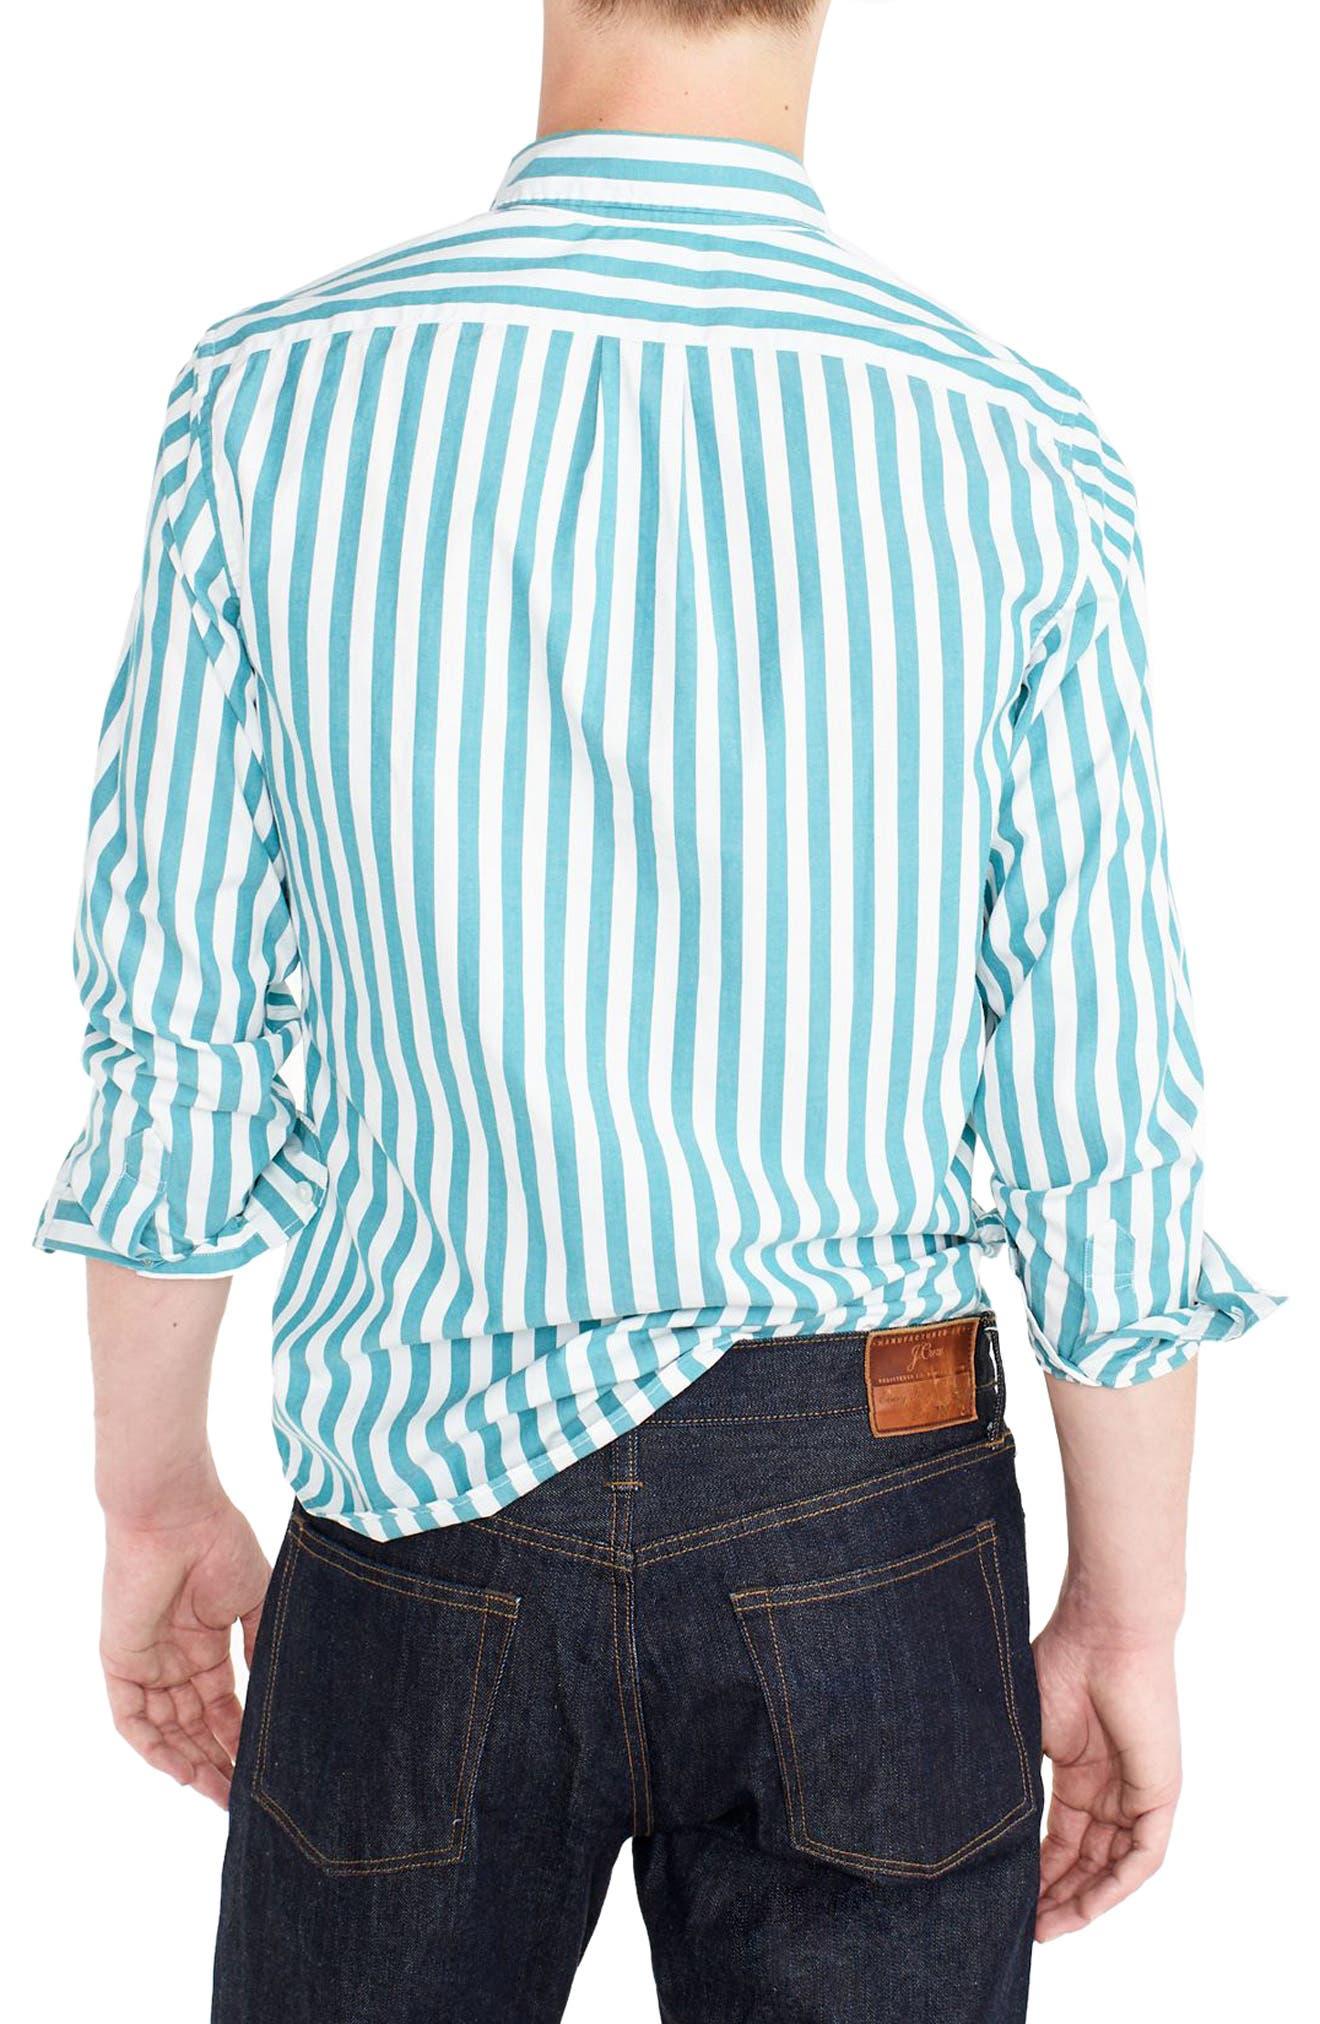 J.Crew Slim Fit Stretch Secret Wash Stripe Sport Shirt,                             Alternate thumbnail 2, color,                             Bright Turquoise